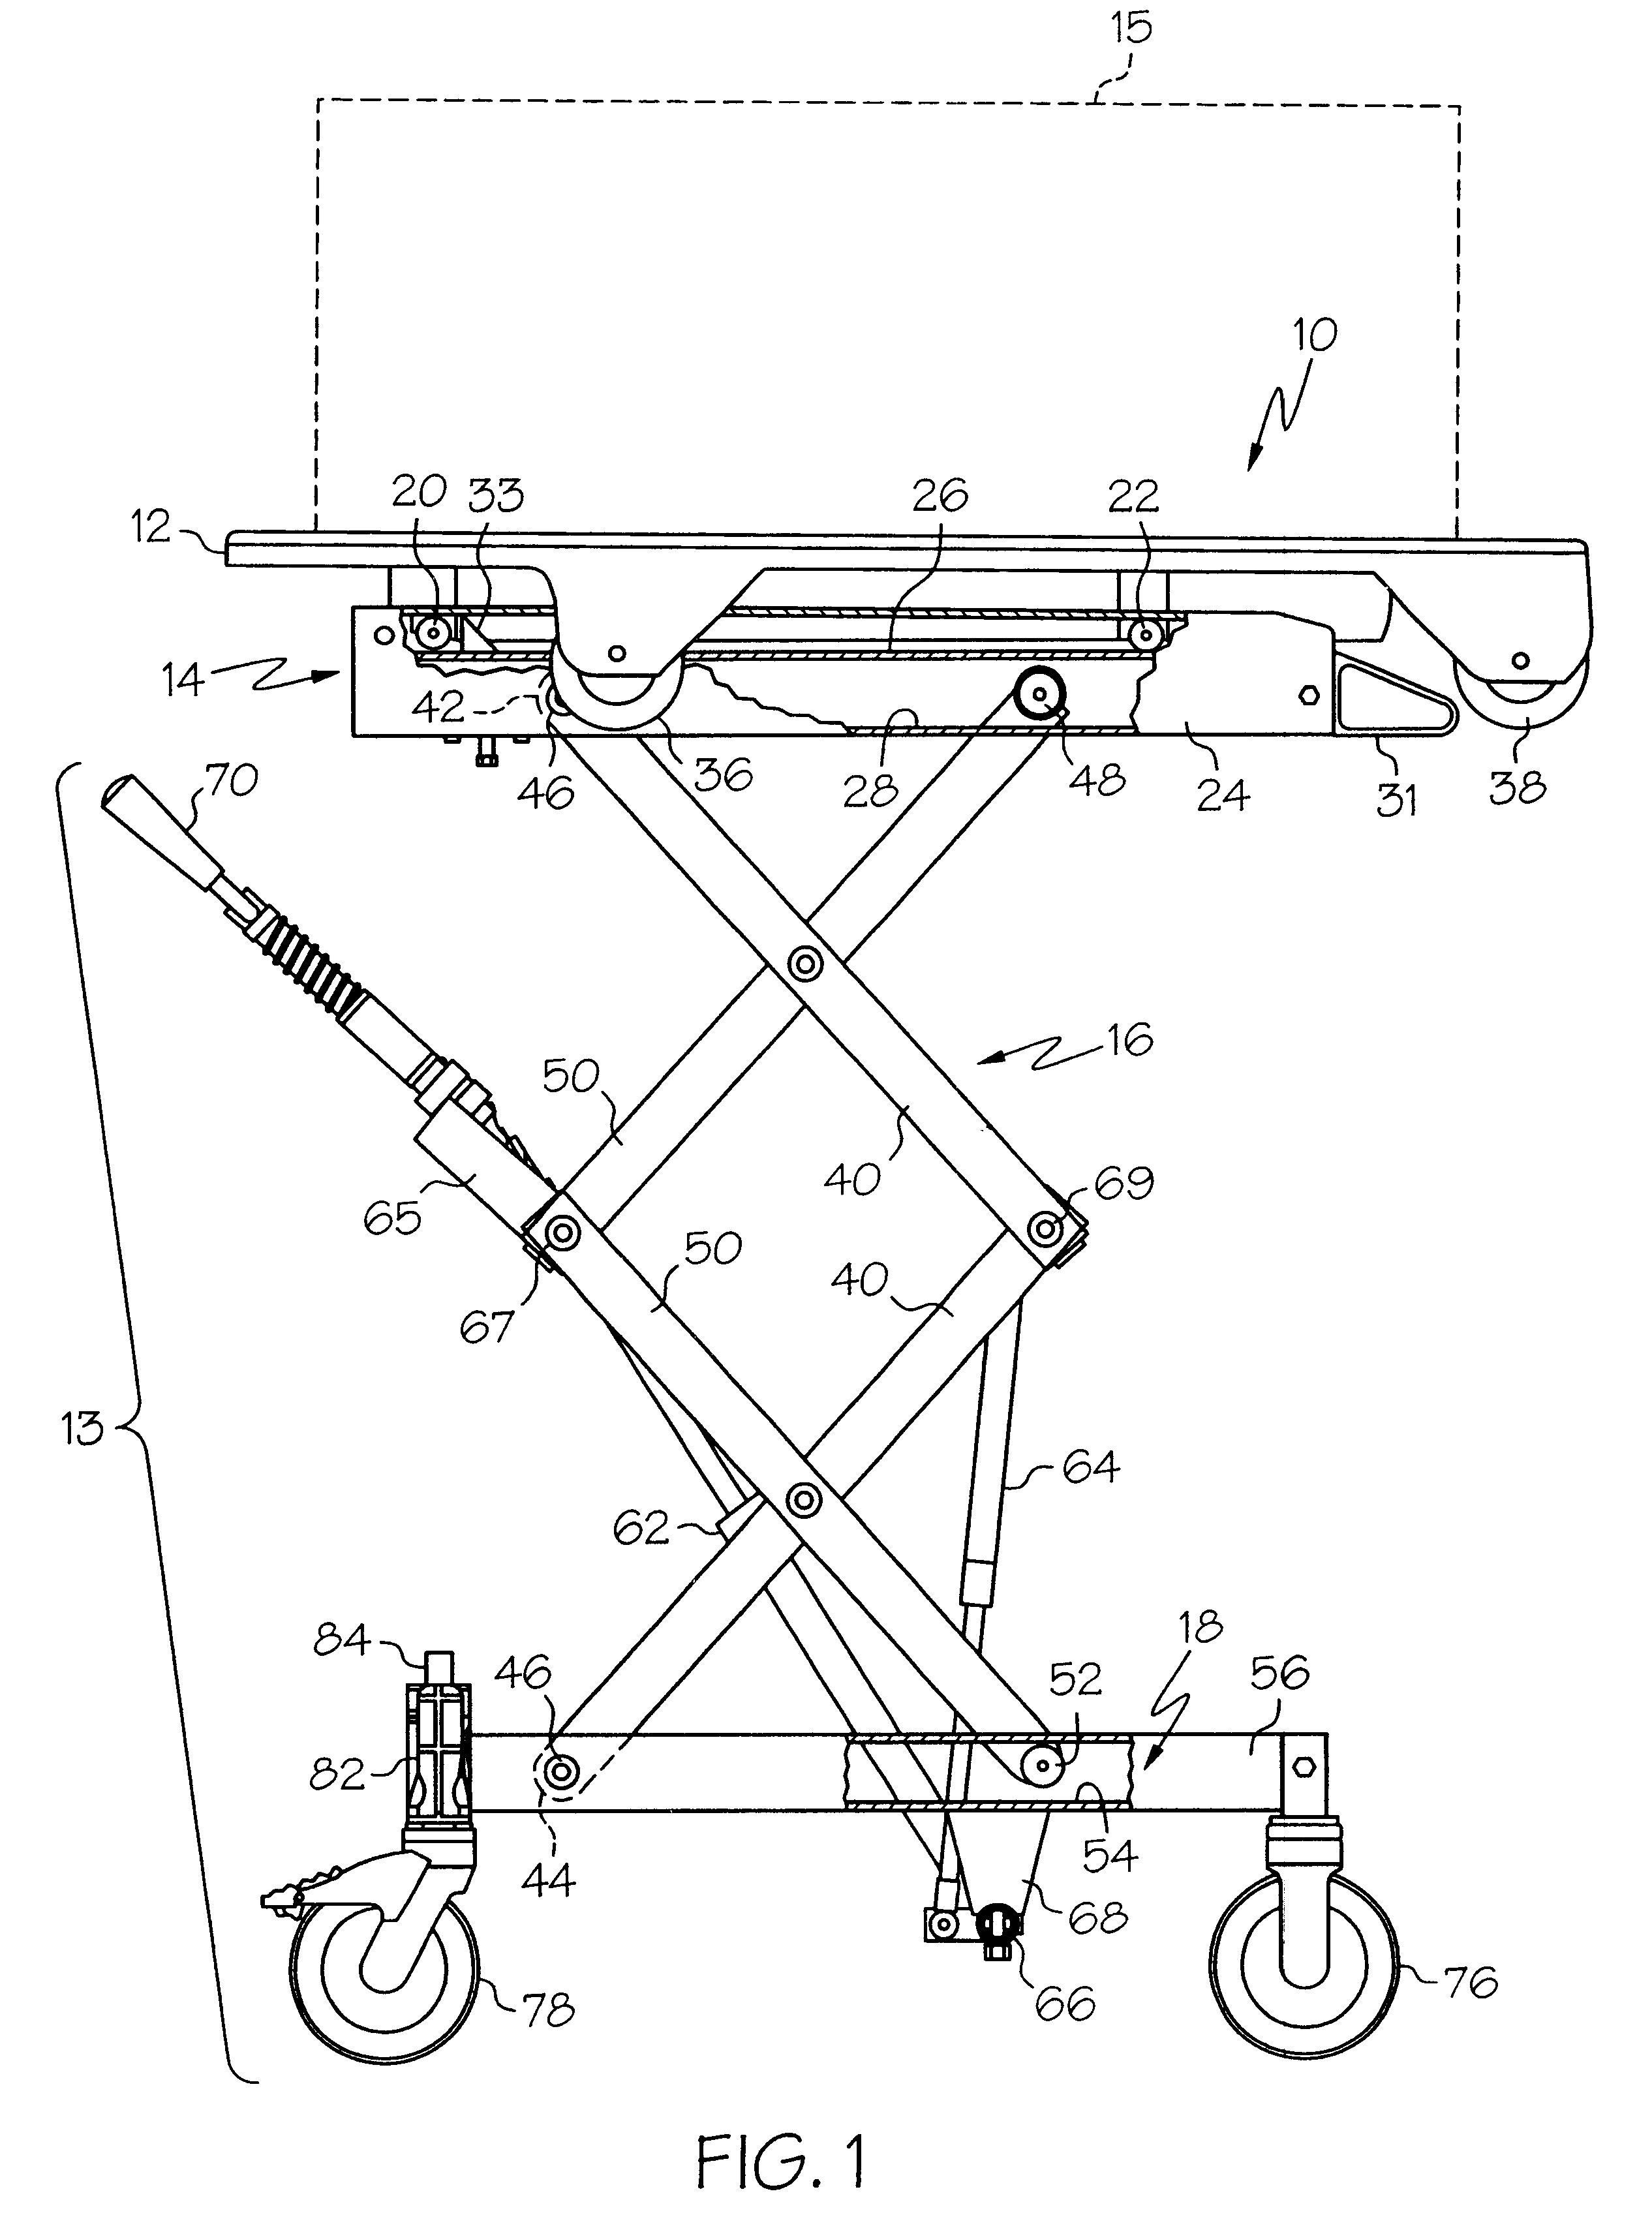 Car diagram southworth lift ez wiring harness diagram dodge dakota patent us6431319 height adjustable equipment cart with detachable a2f37d7cd128e6be77e65781a6875285 147141112801426281 car diagram southworth lift greentooth Gallery